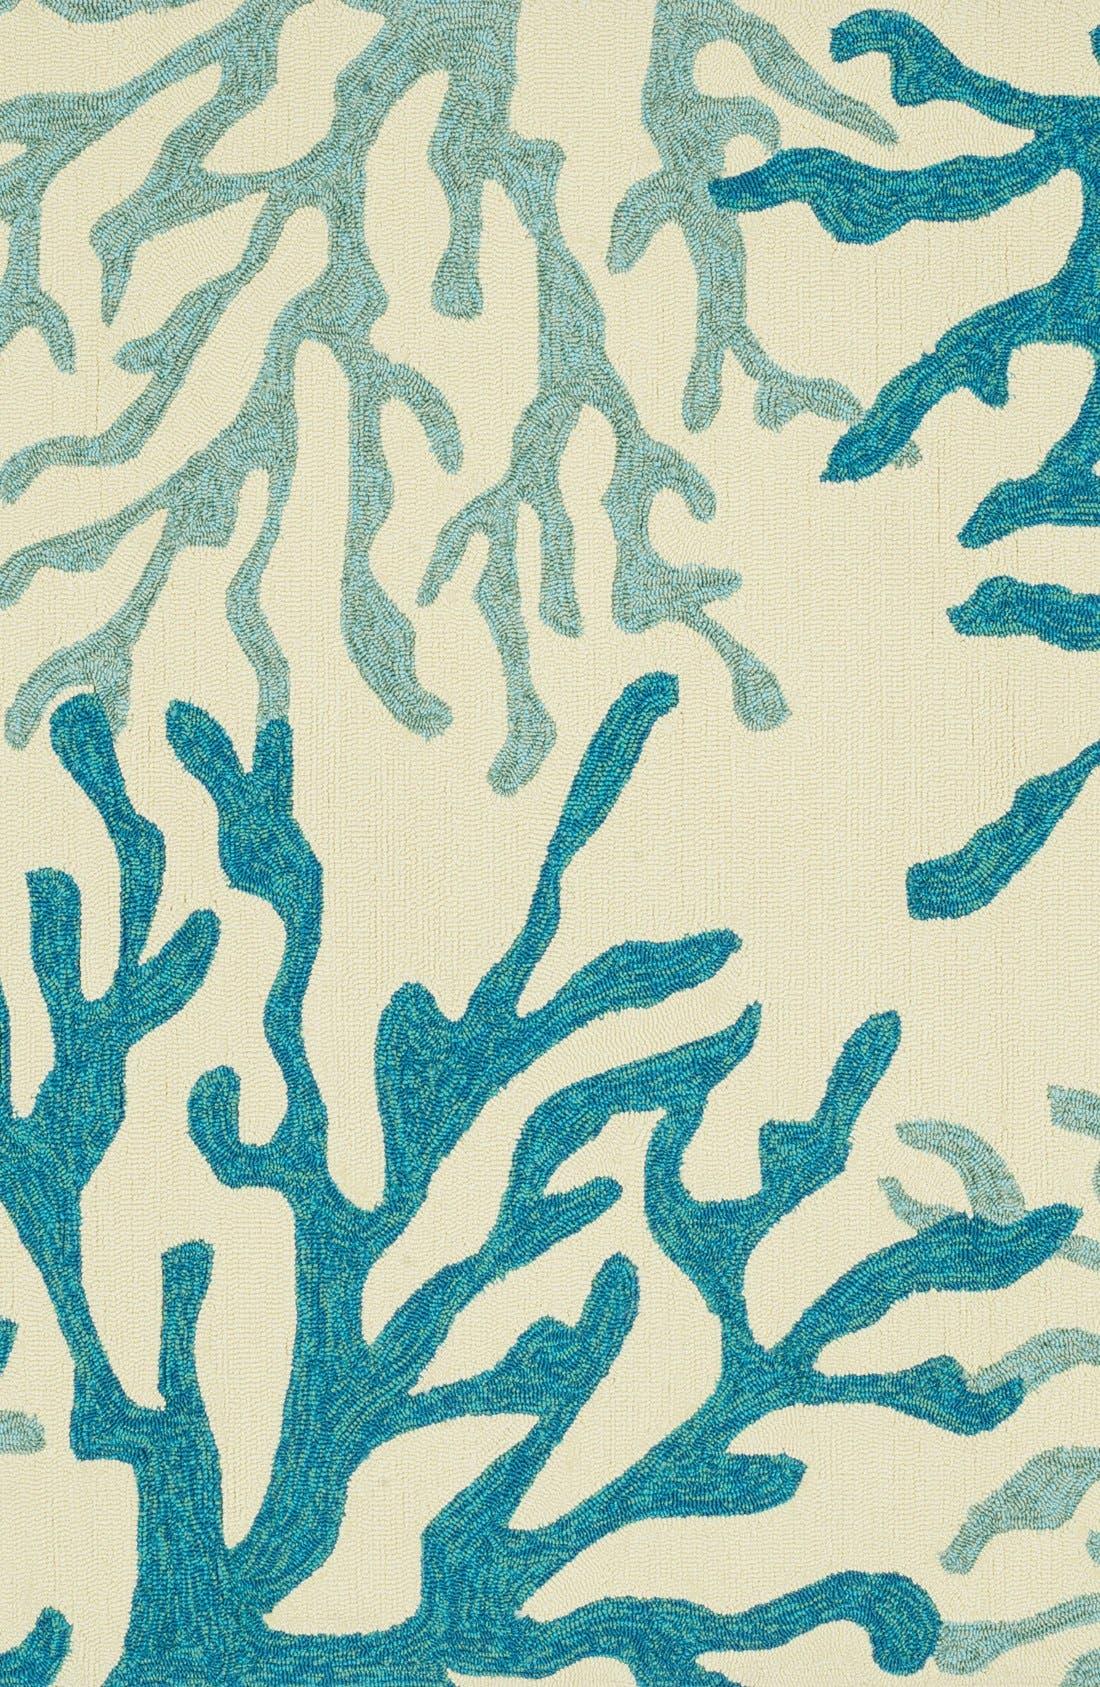 Main Image - Loloi 'Ventura Coral' Hank Hooked Indoor/Outdoor Rug